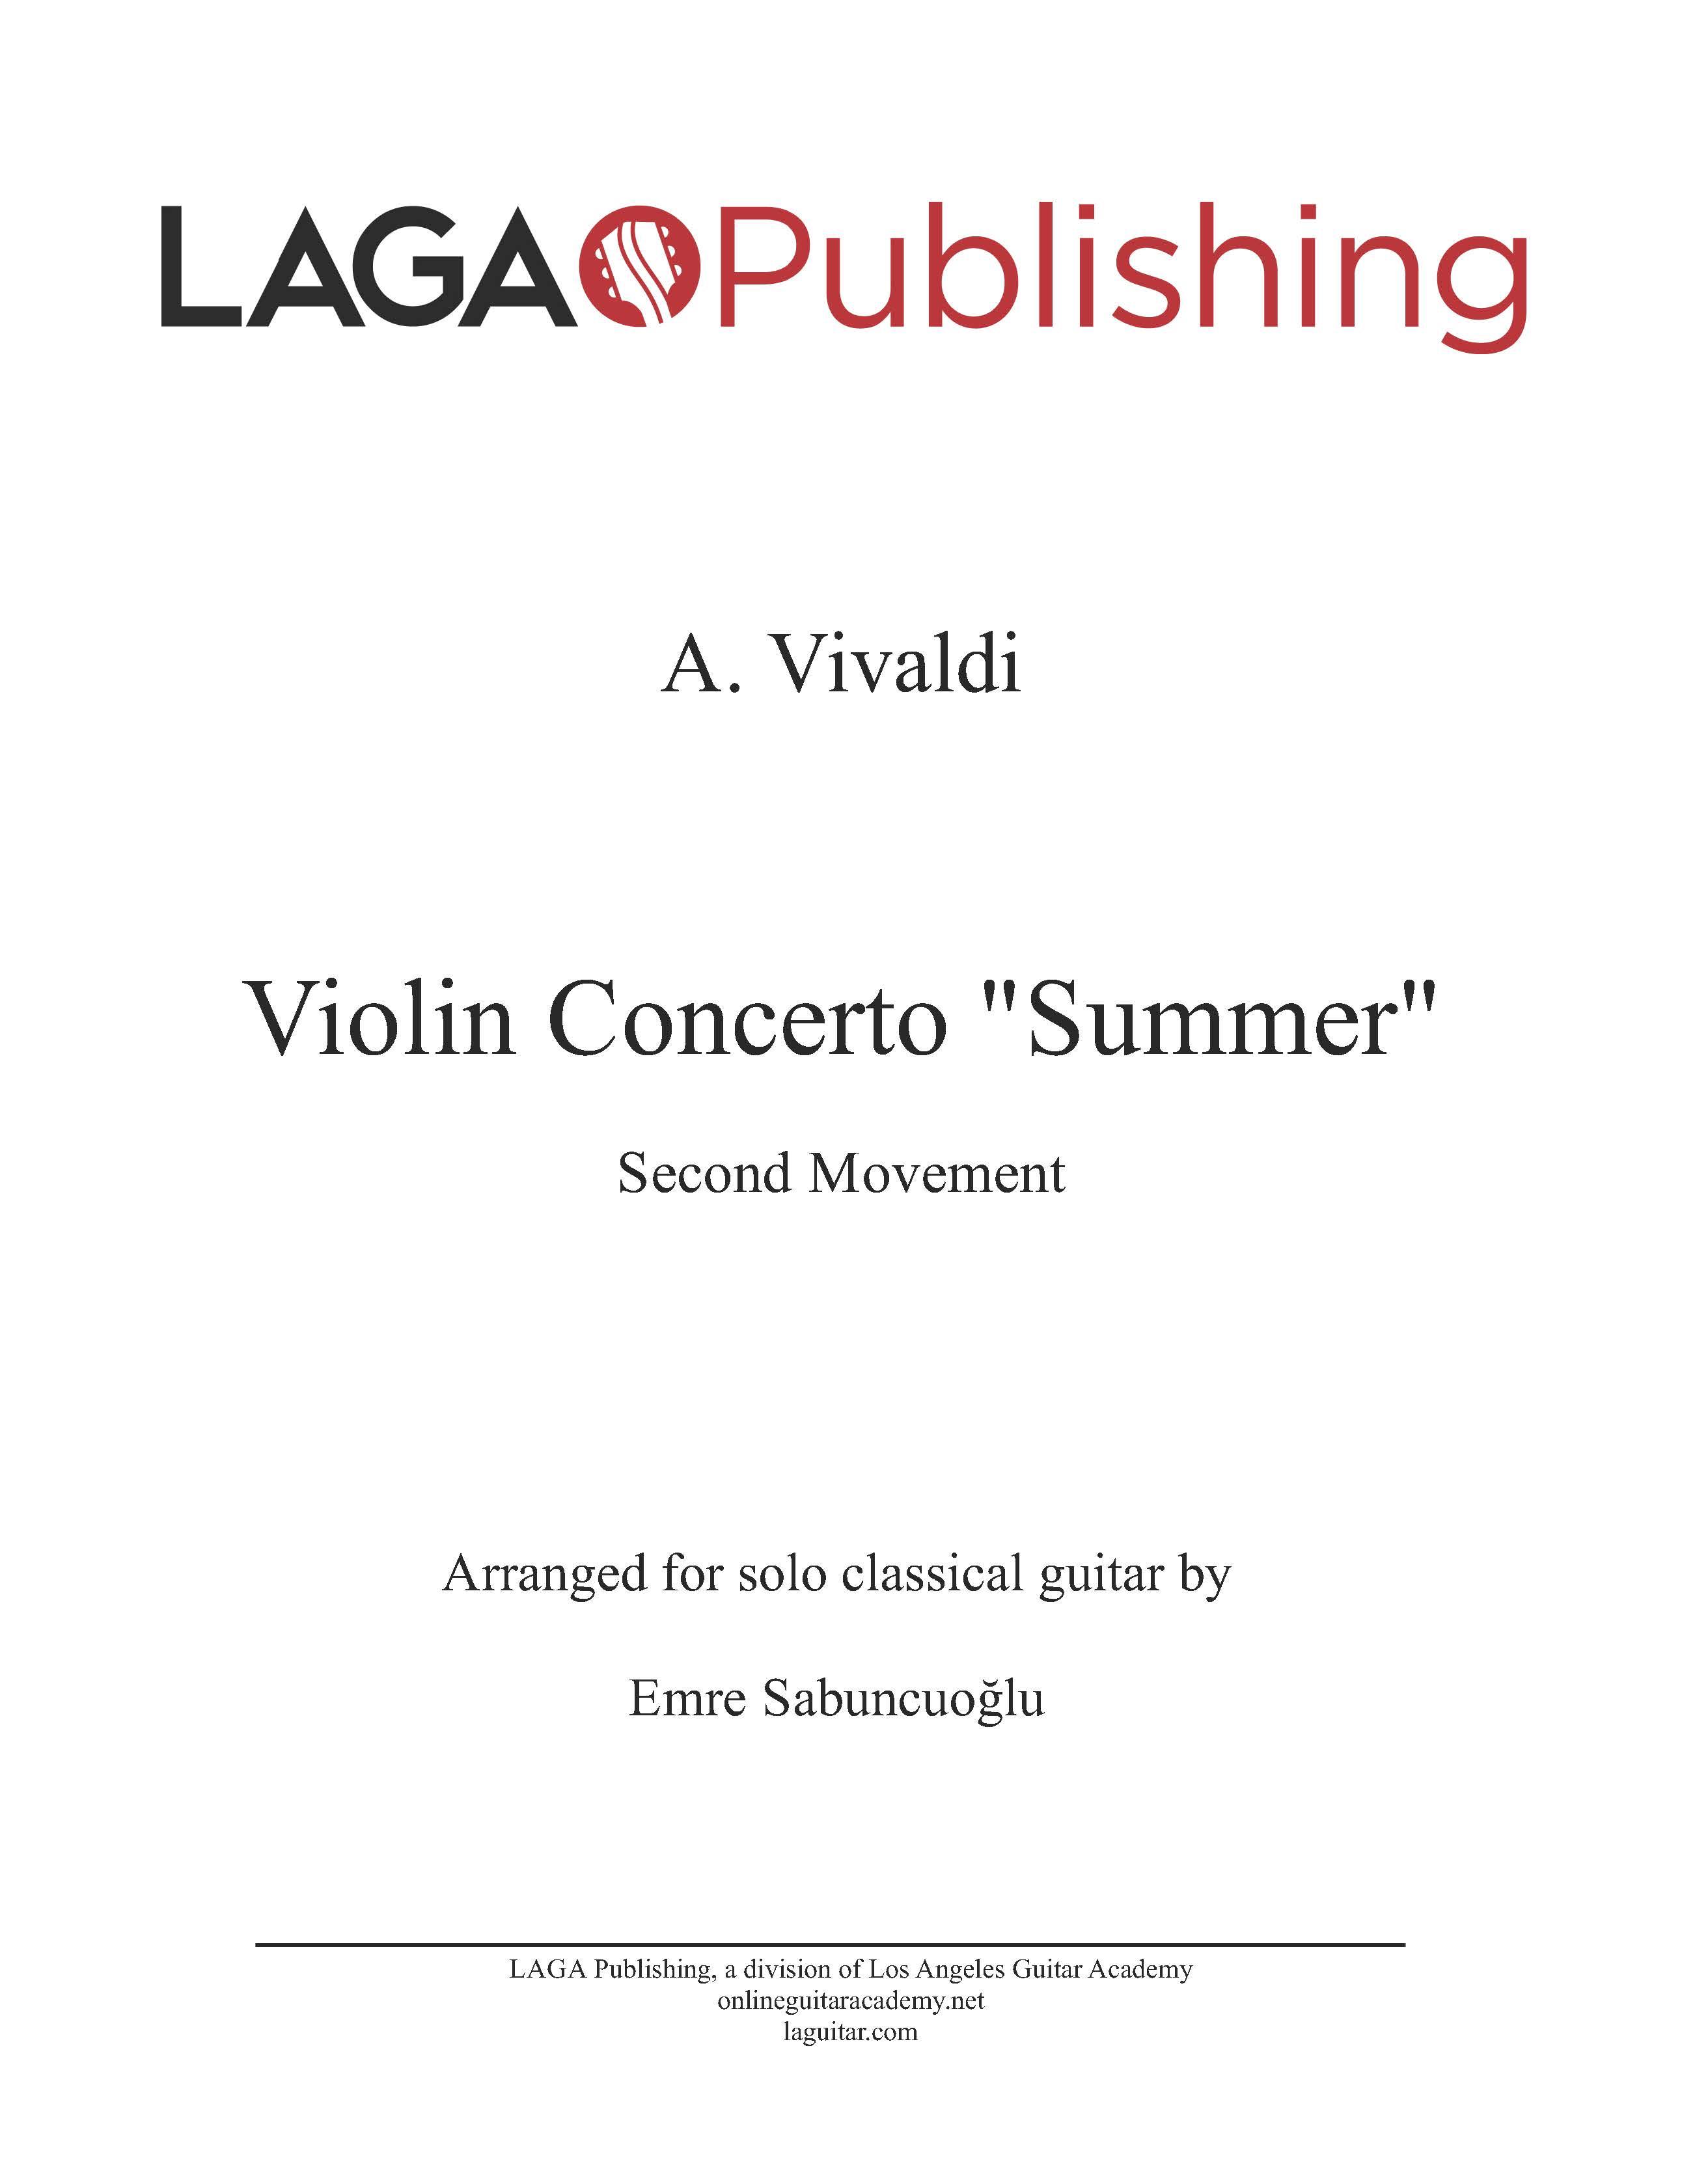 LAGA-Publishing-Vivaldi-4Seasons-Summer-II_Page_1